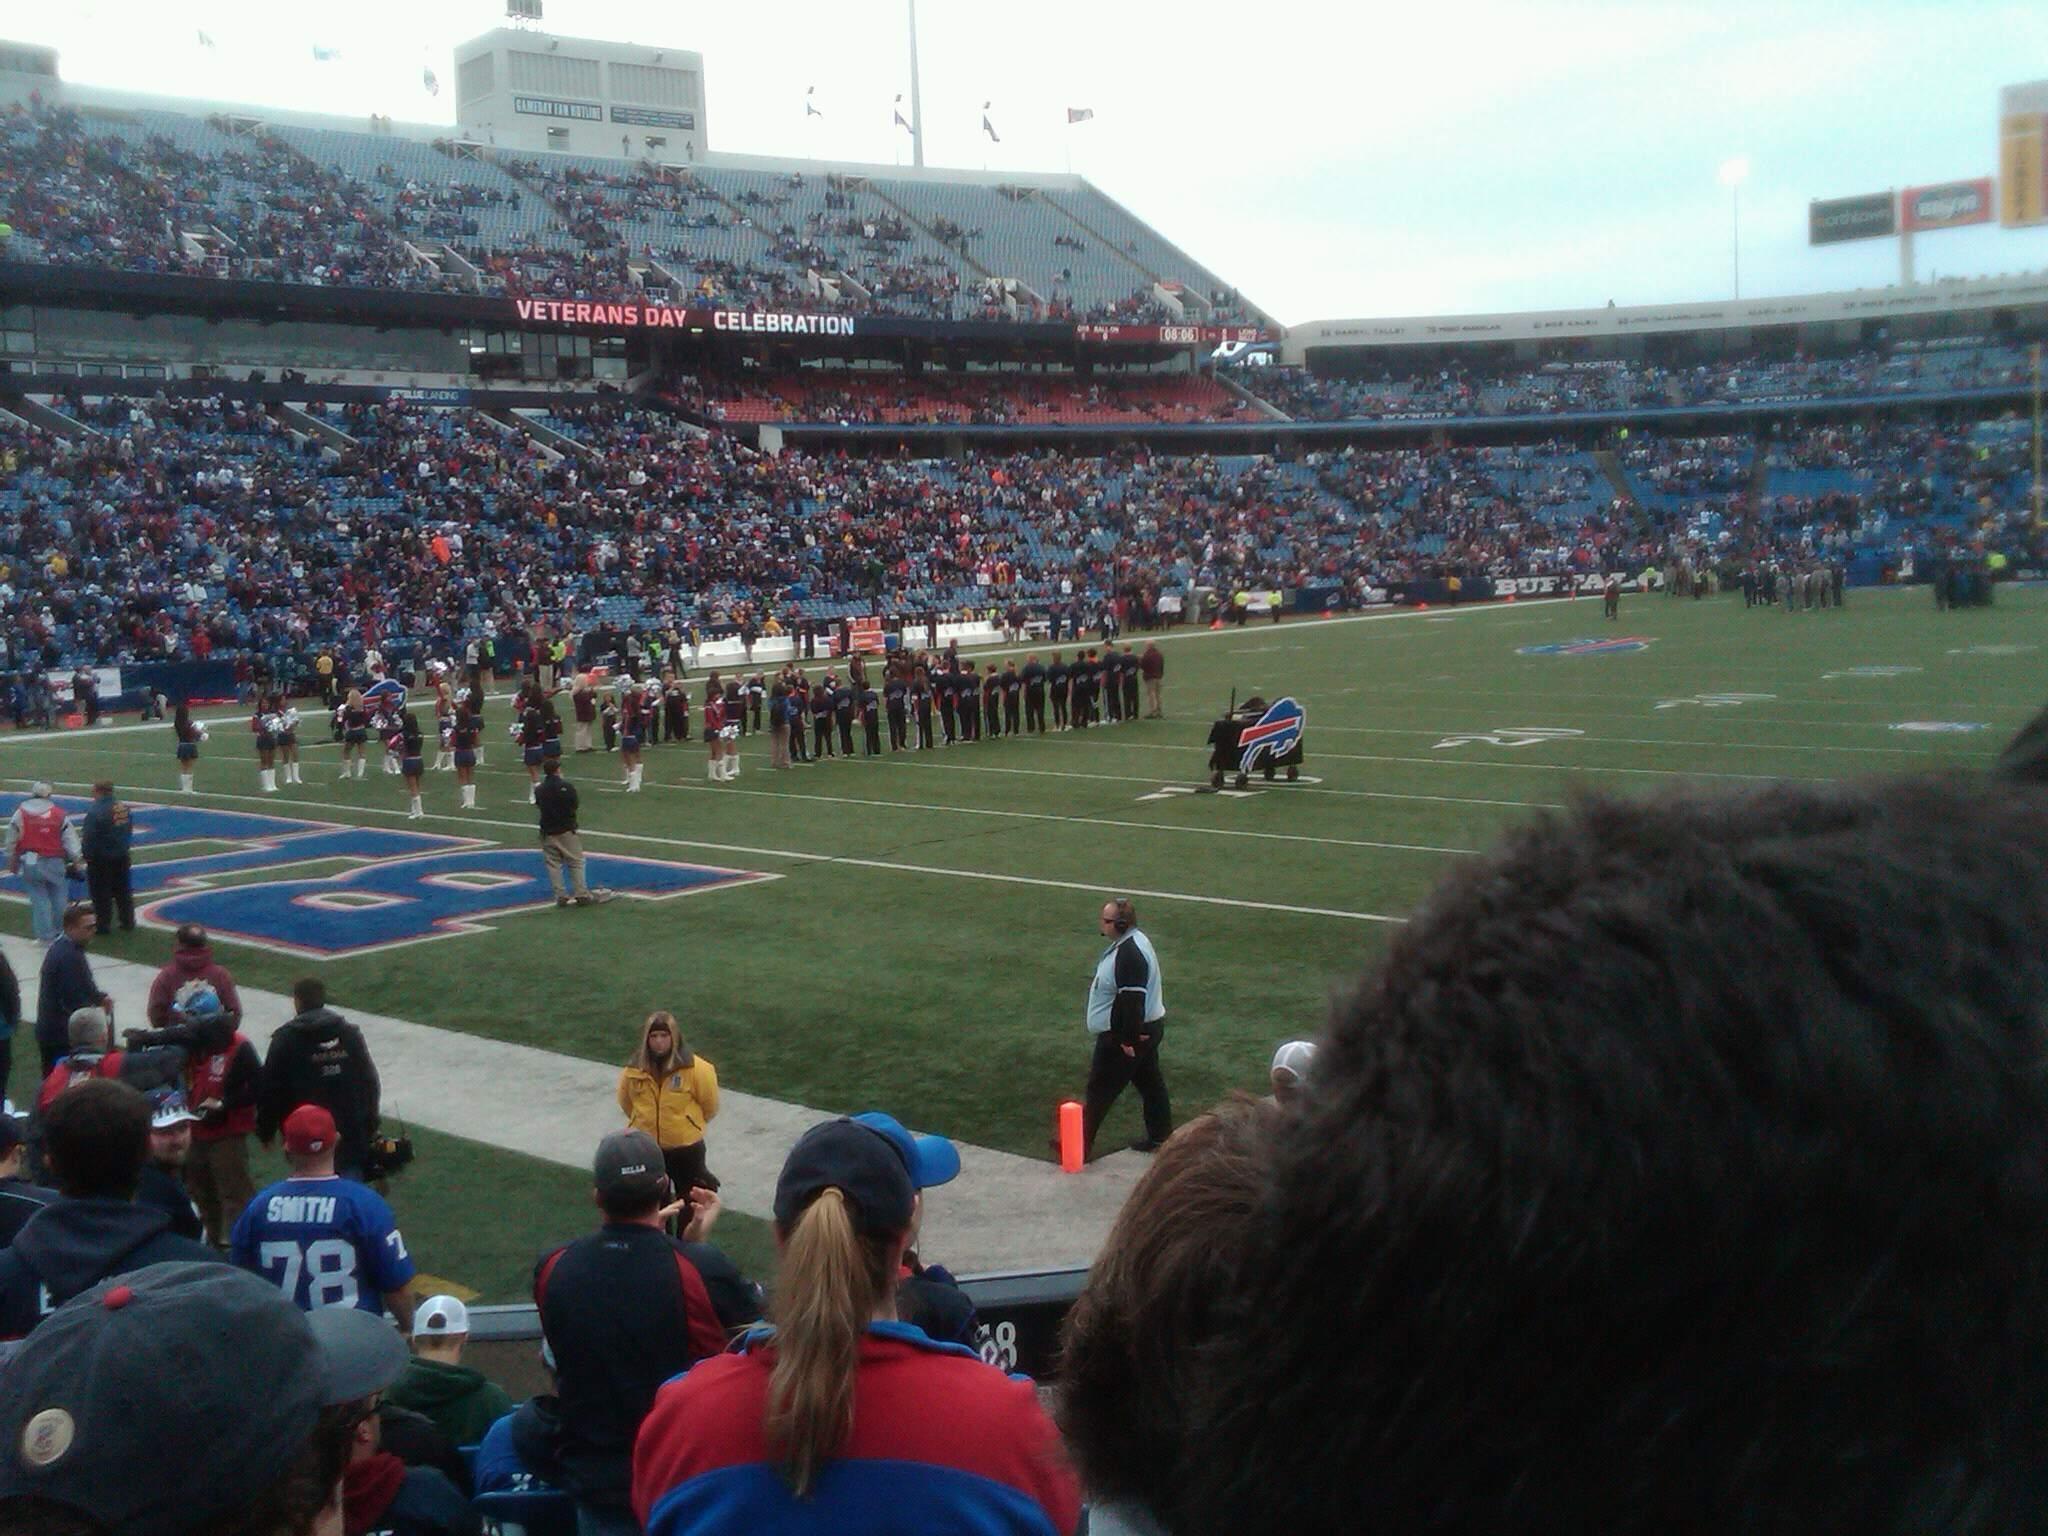 New Era Field Section 140 Row 11 Seat 1